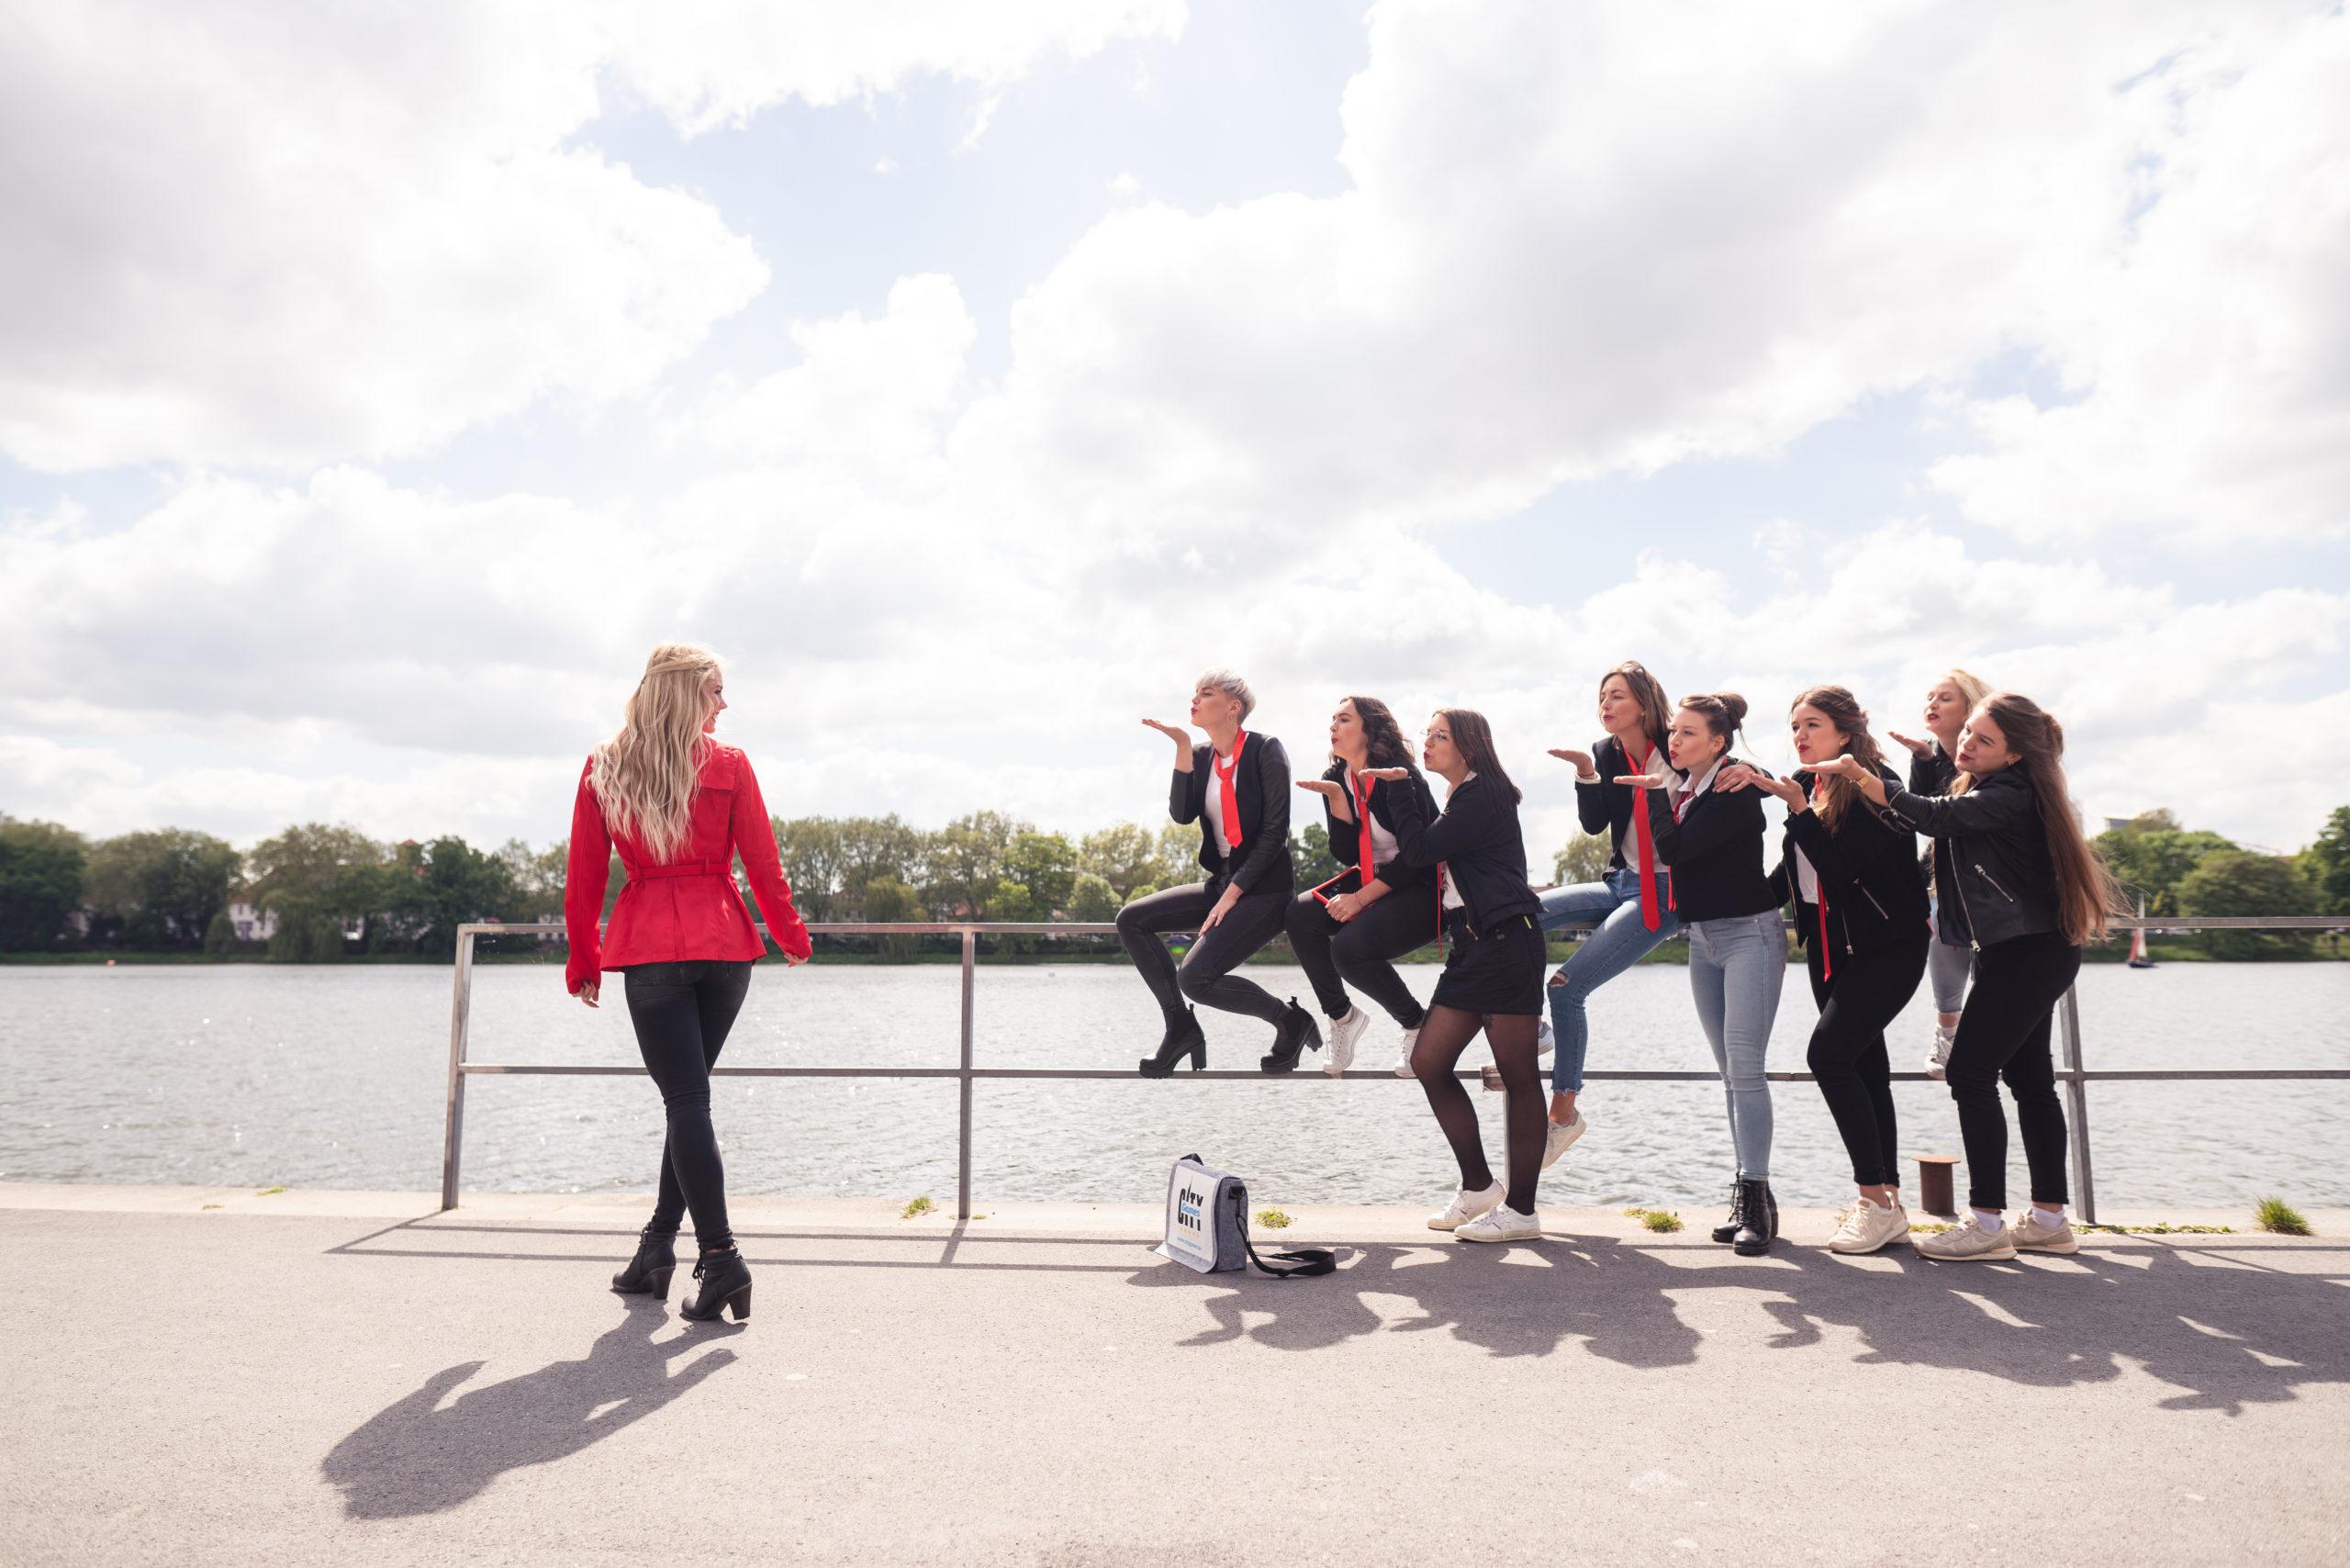 CityGames Leipzig JGA Frauen Tour: Girls Wanna Have Fun